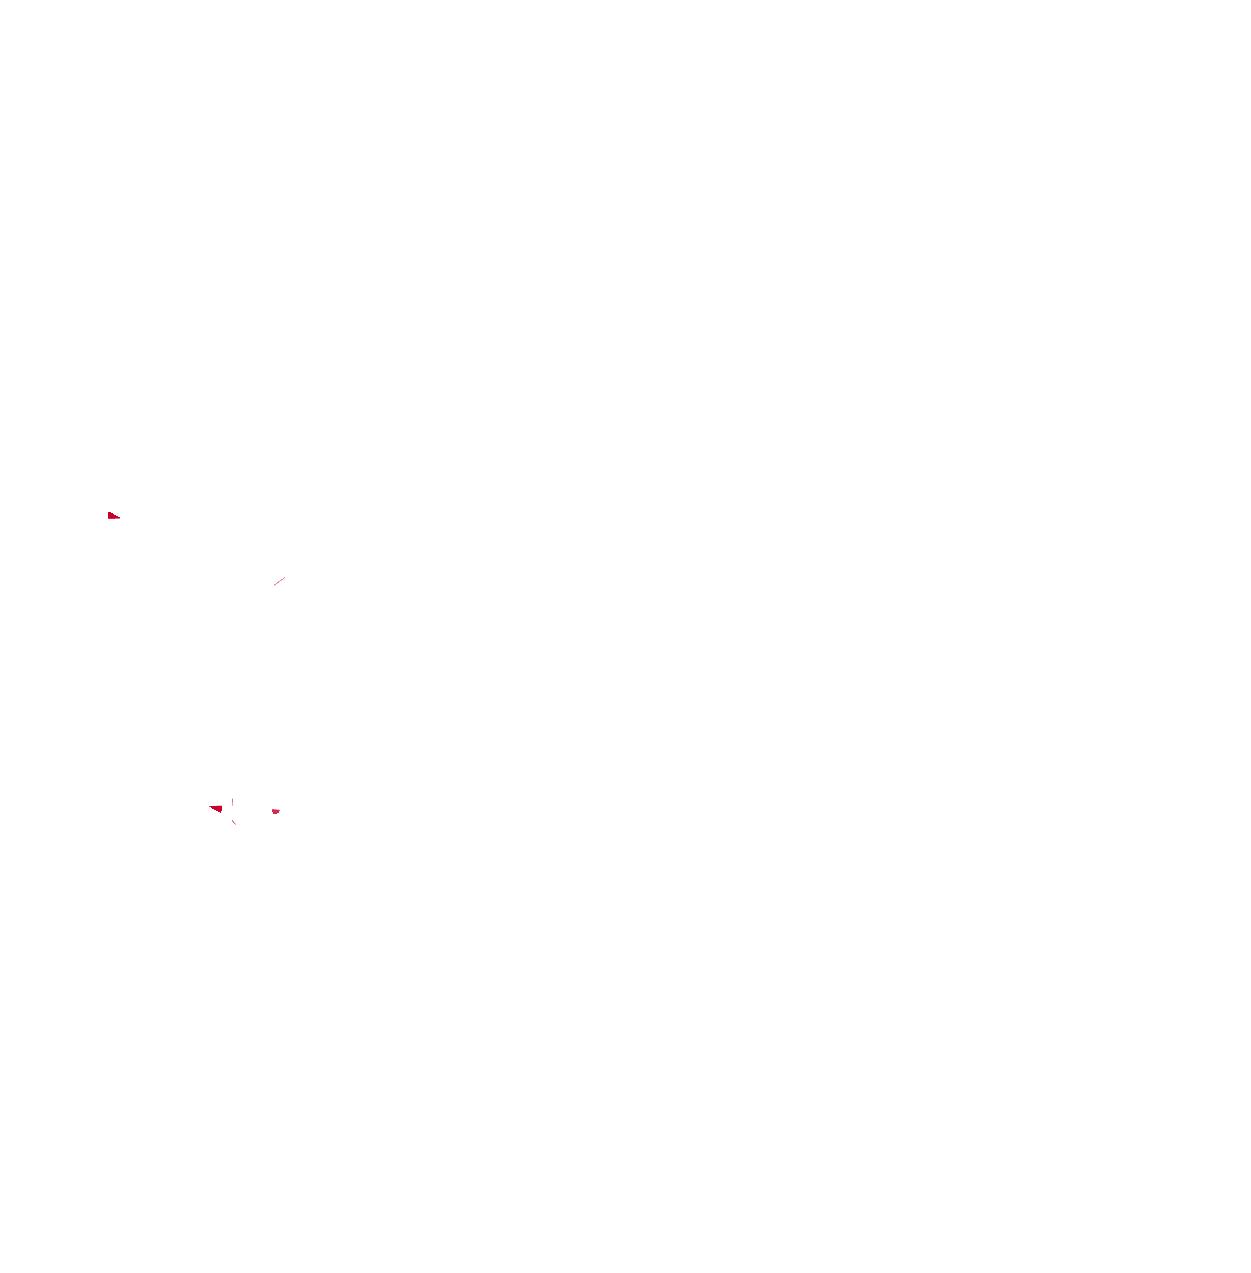 img-web-clientlist_white-logo copy 31.png